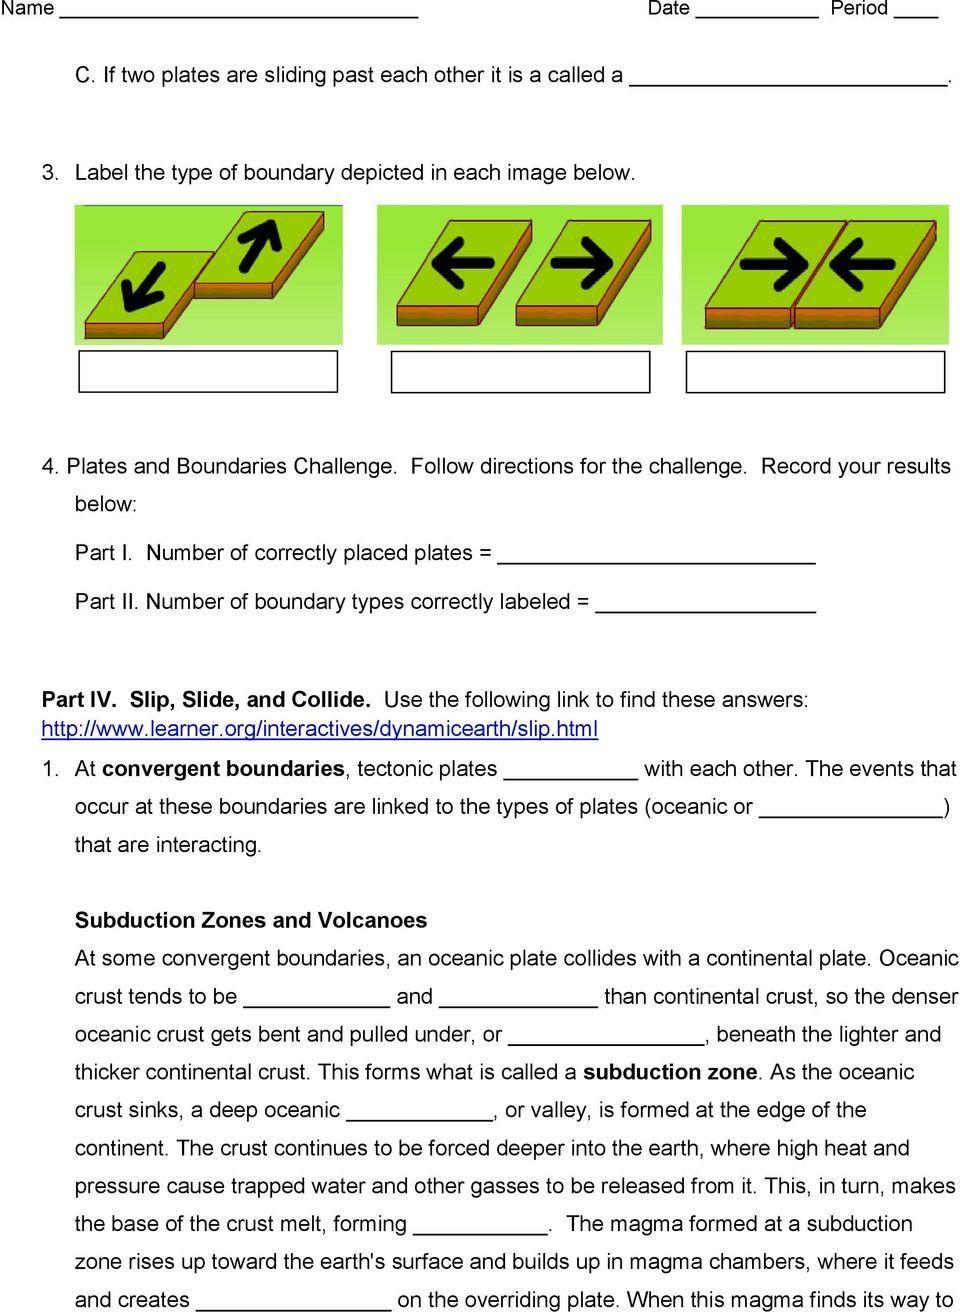 Plate Tectonics Worksheet 6th Grade Plate Tectonics Web Quest Pdf Free Download In 2020 Math Addition Worksheets 6th Grade Worksheets First Grade Math Worksheets